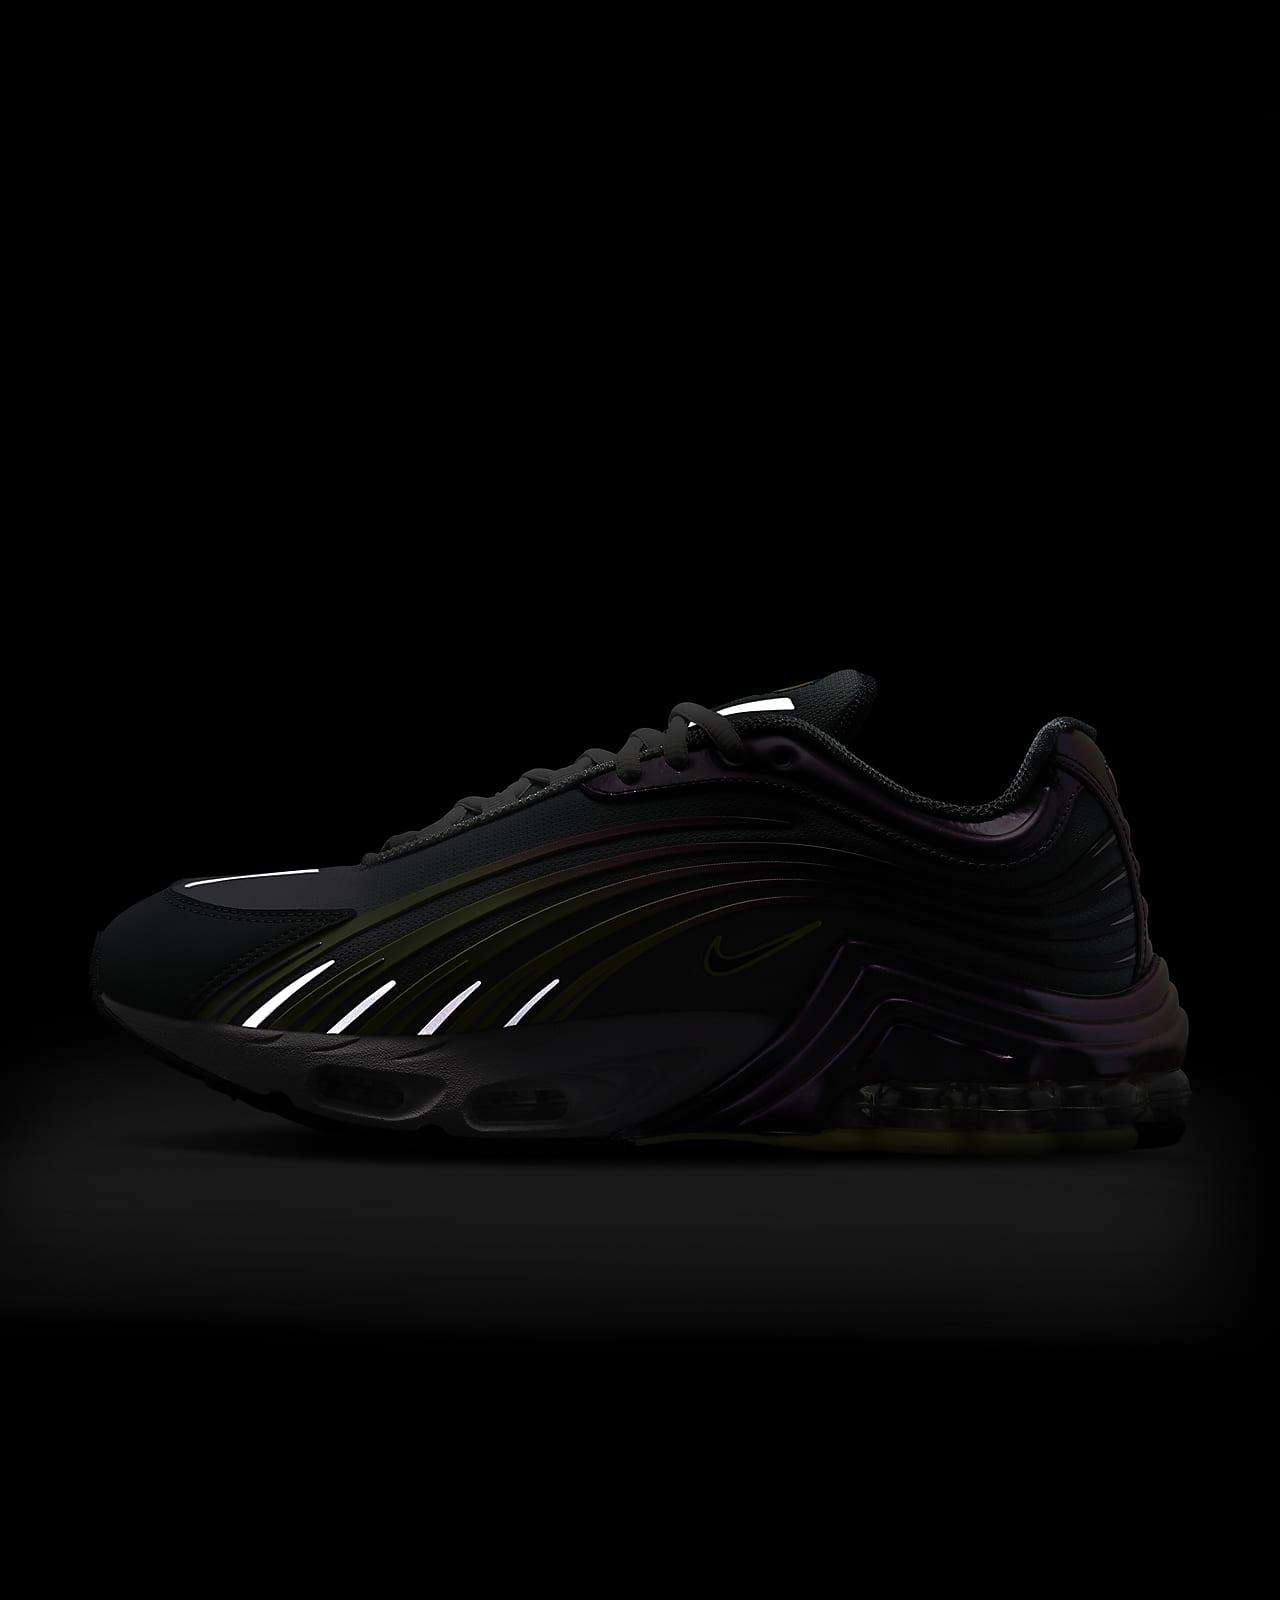 Chaussure Nike Air Max Plus 2 pour Homme